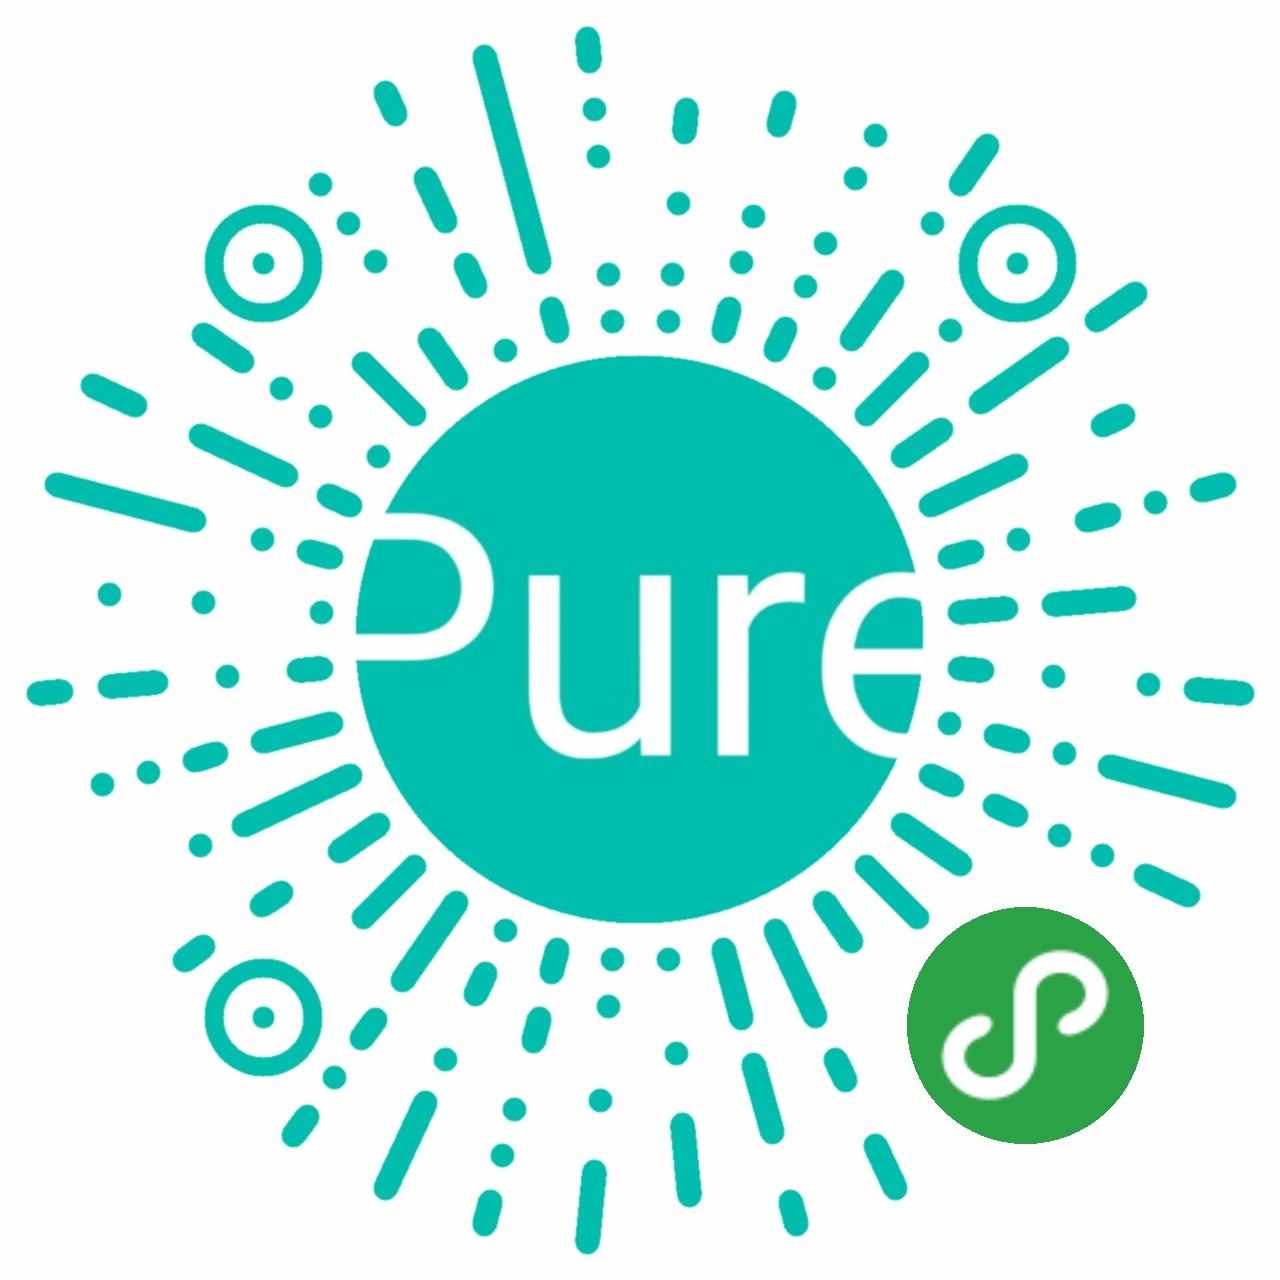 Pure头像-微信小程序二维码